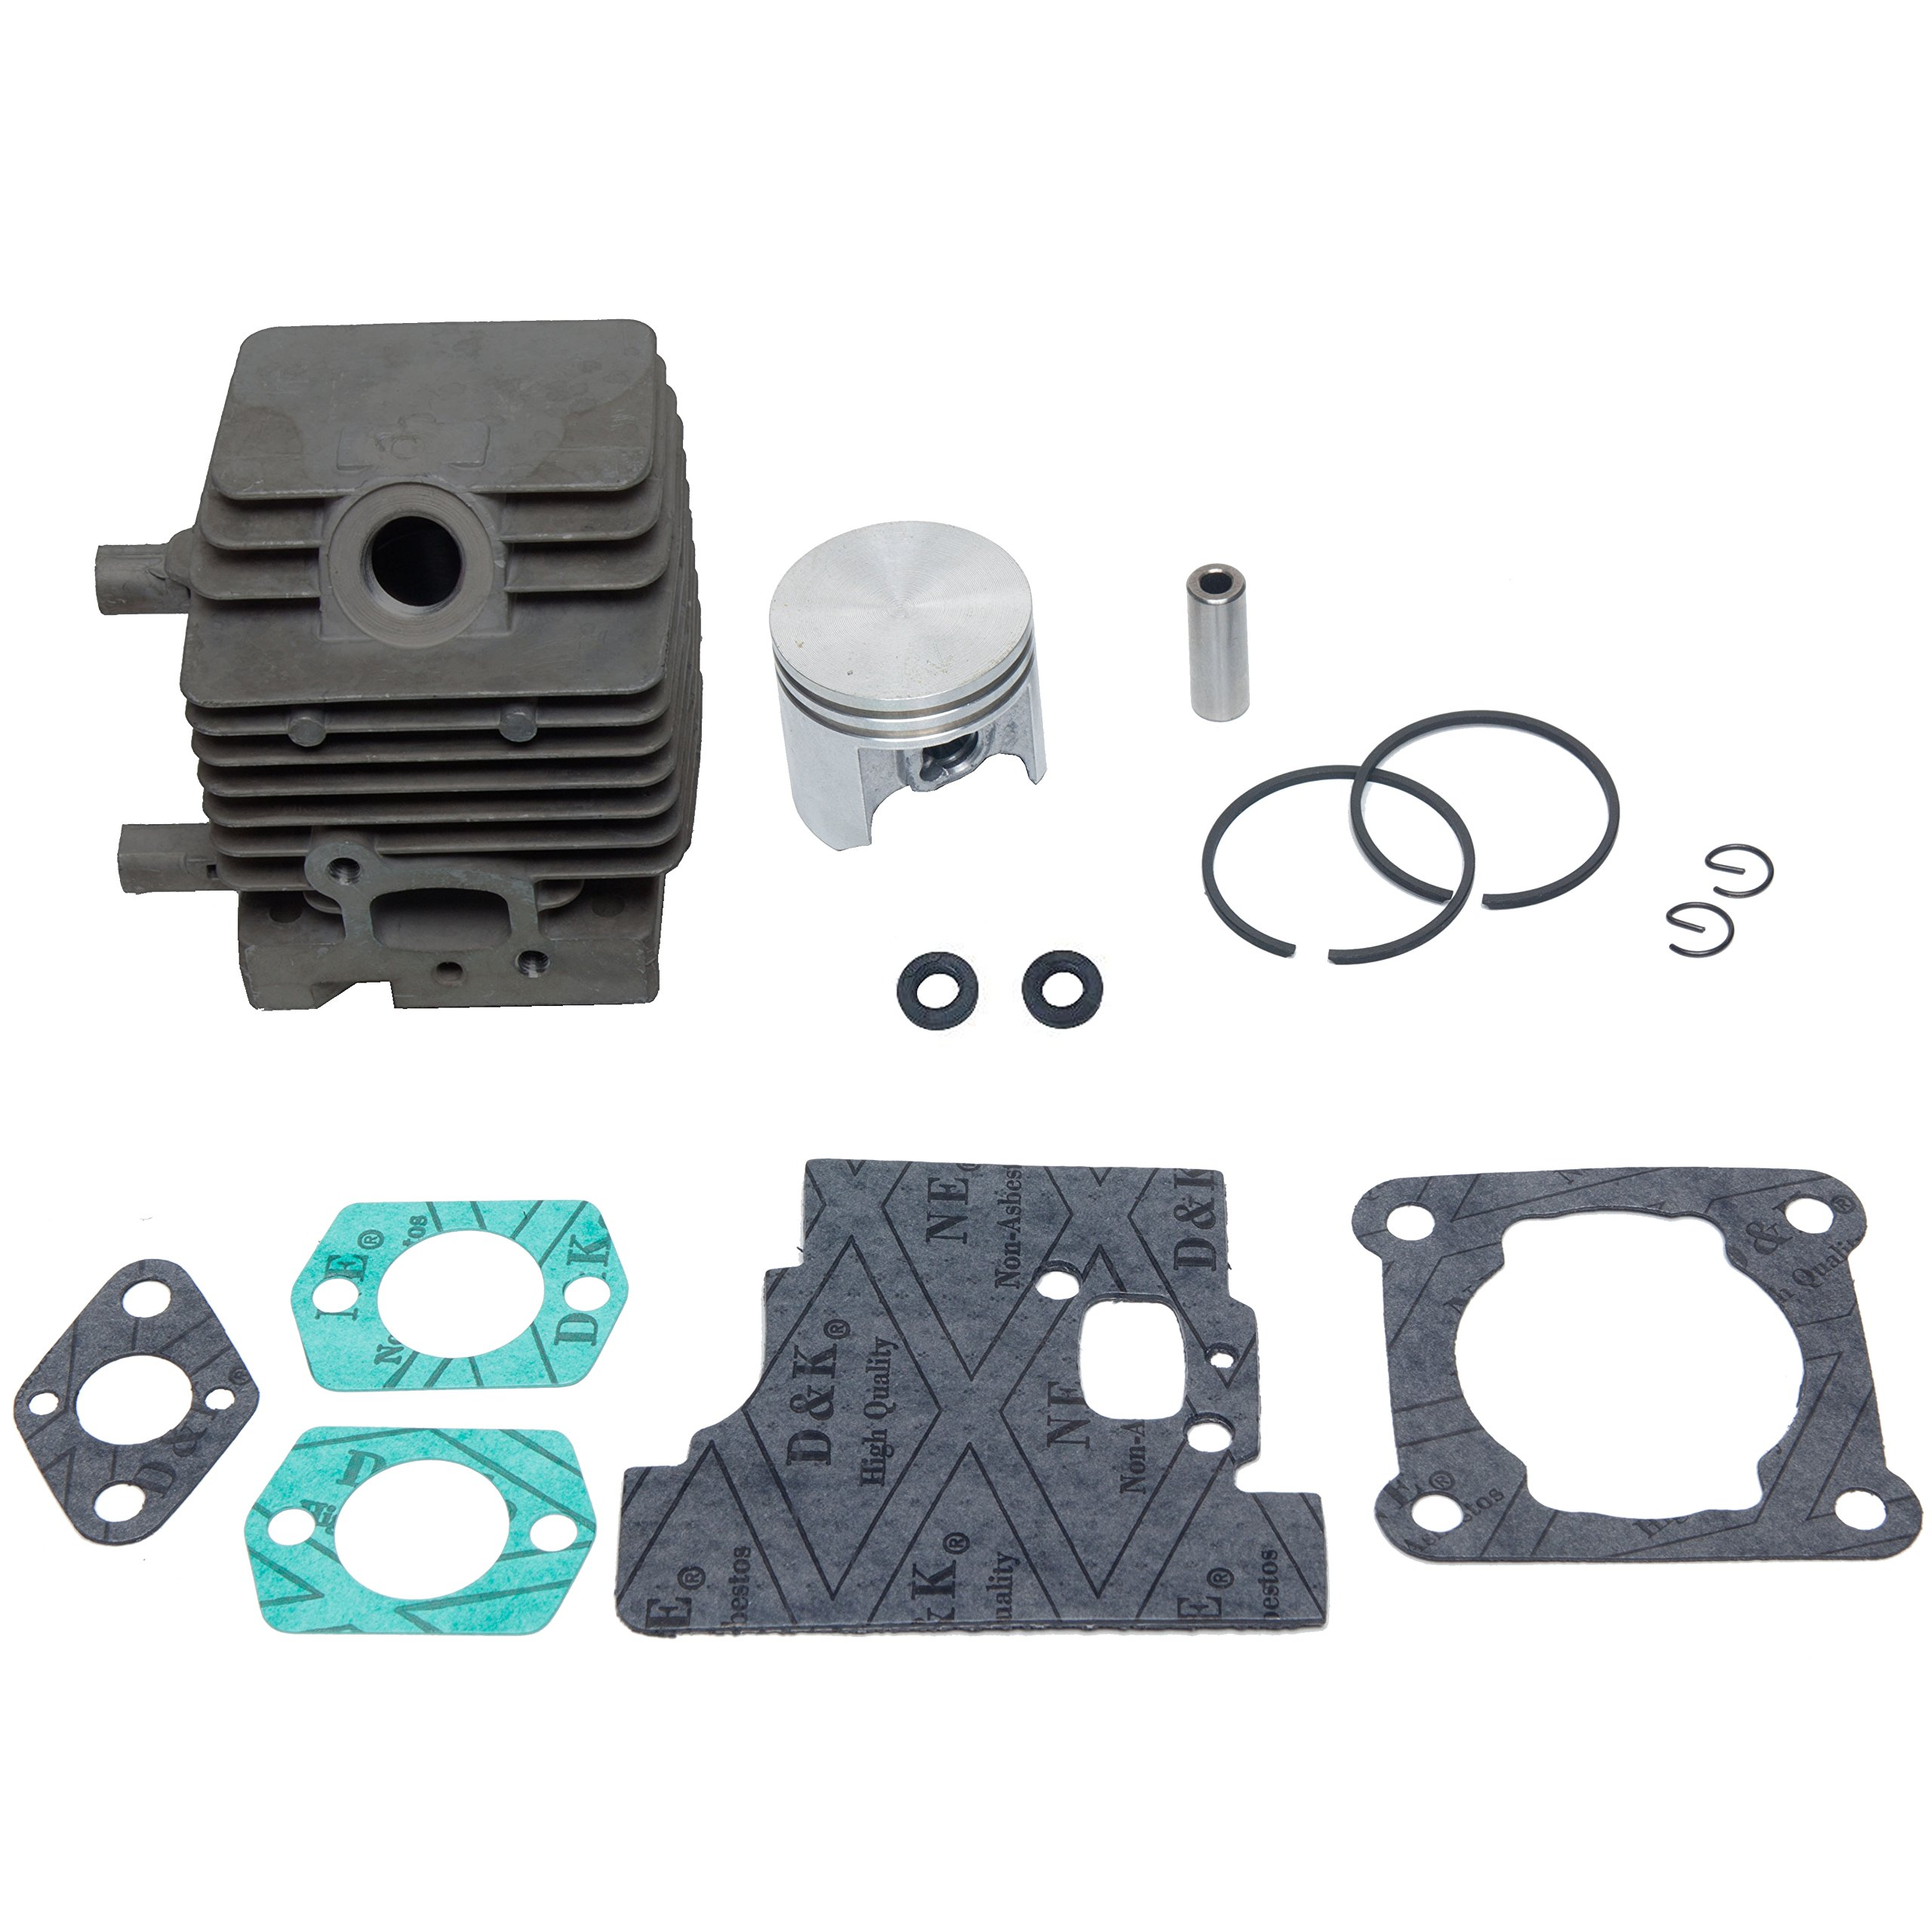 SPERTEK Cylinder & Piston Kit + Gasket Kit for Stihl FS75 FS80 FS85 34mm (W/2 Oil Seals) by SPERTEK